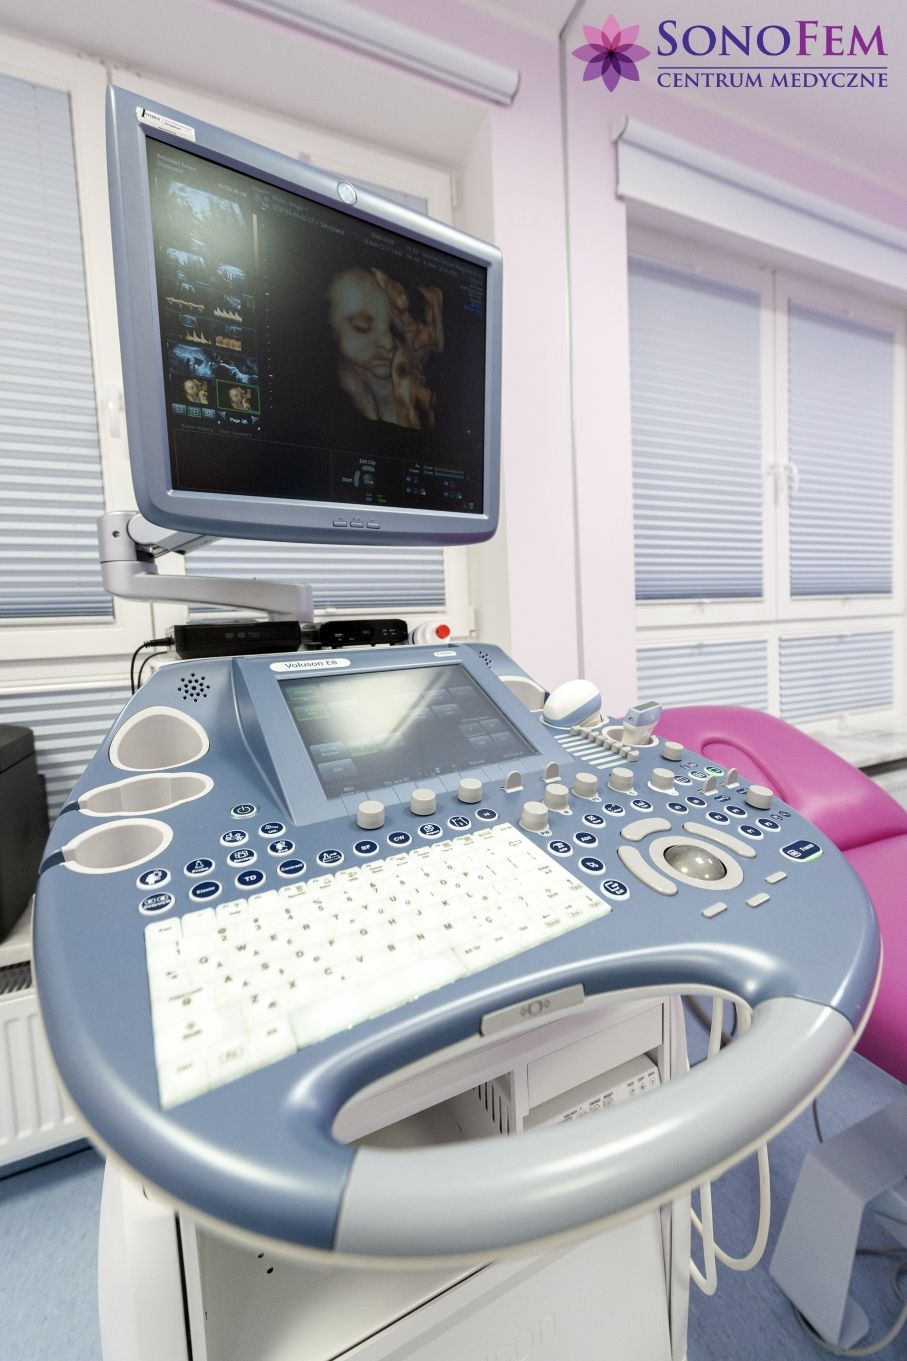 SonoFem Centrum Medyczne_USG_